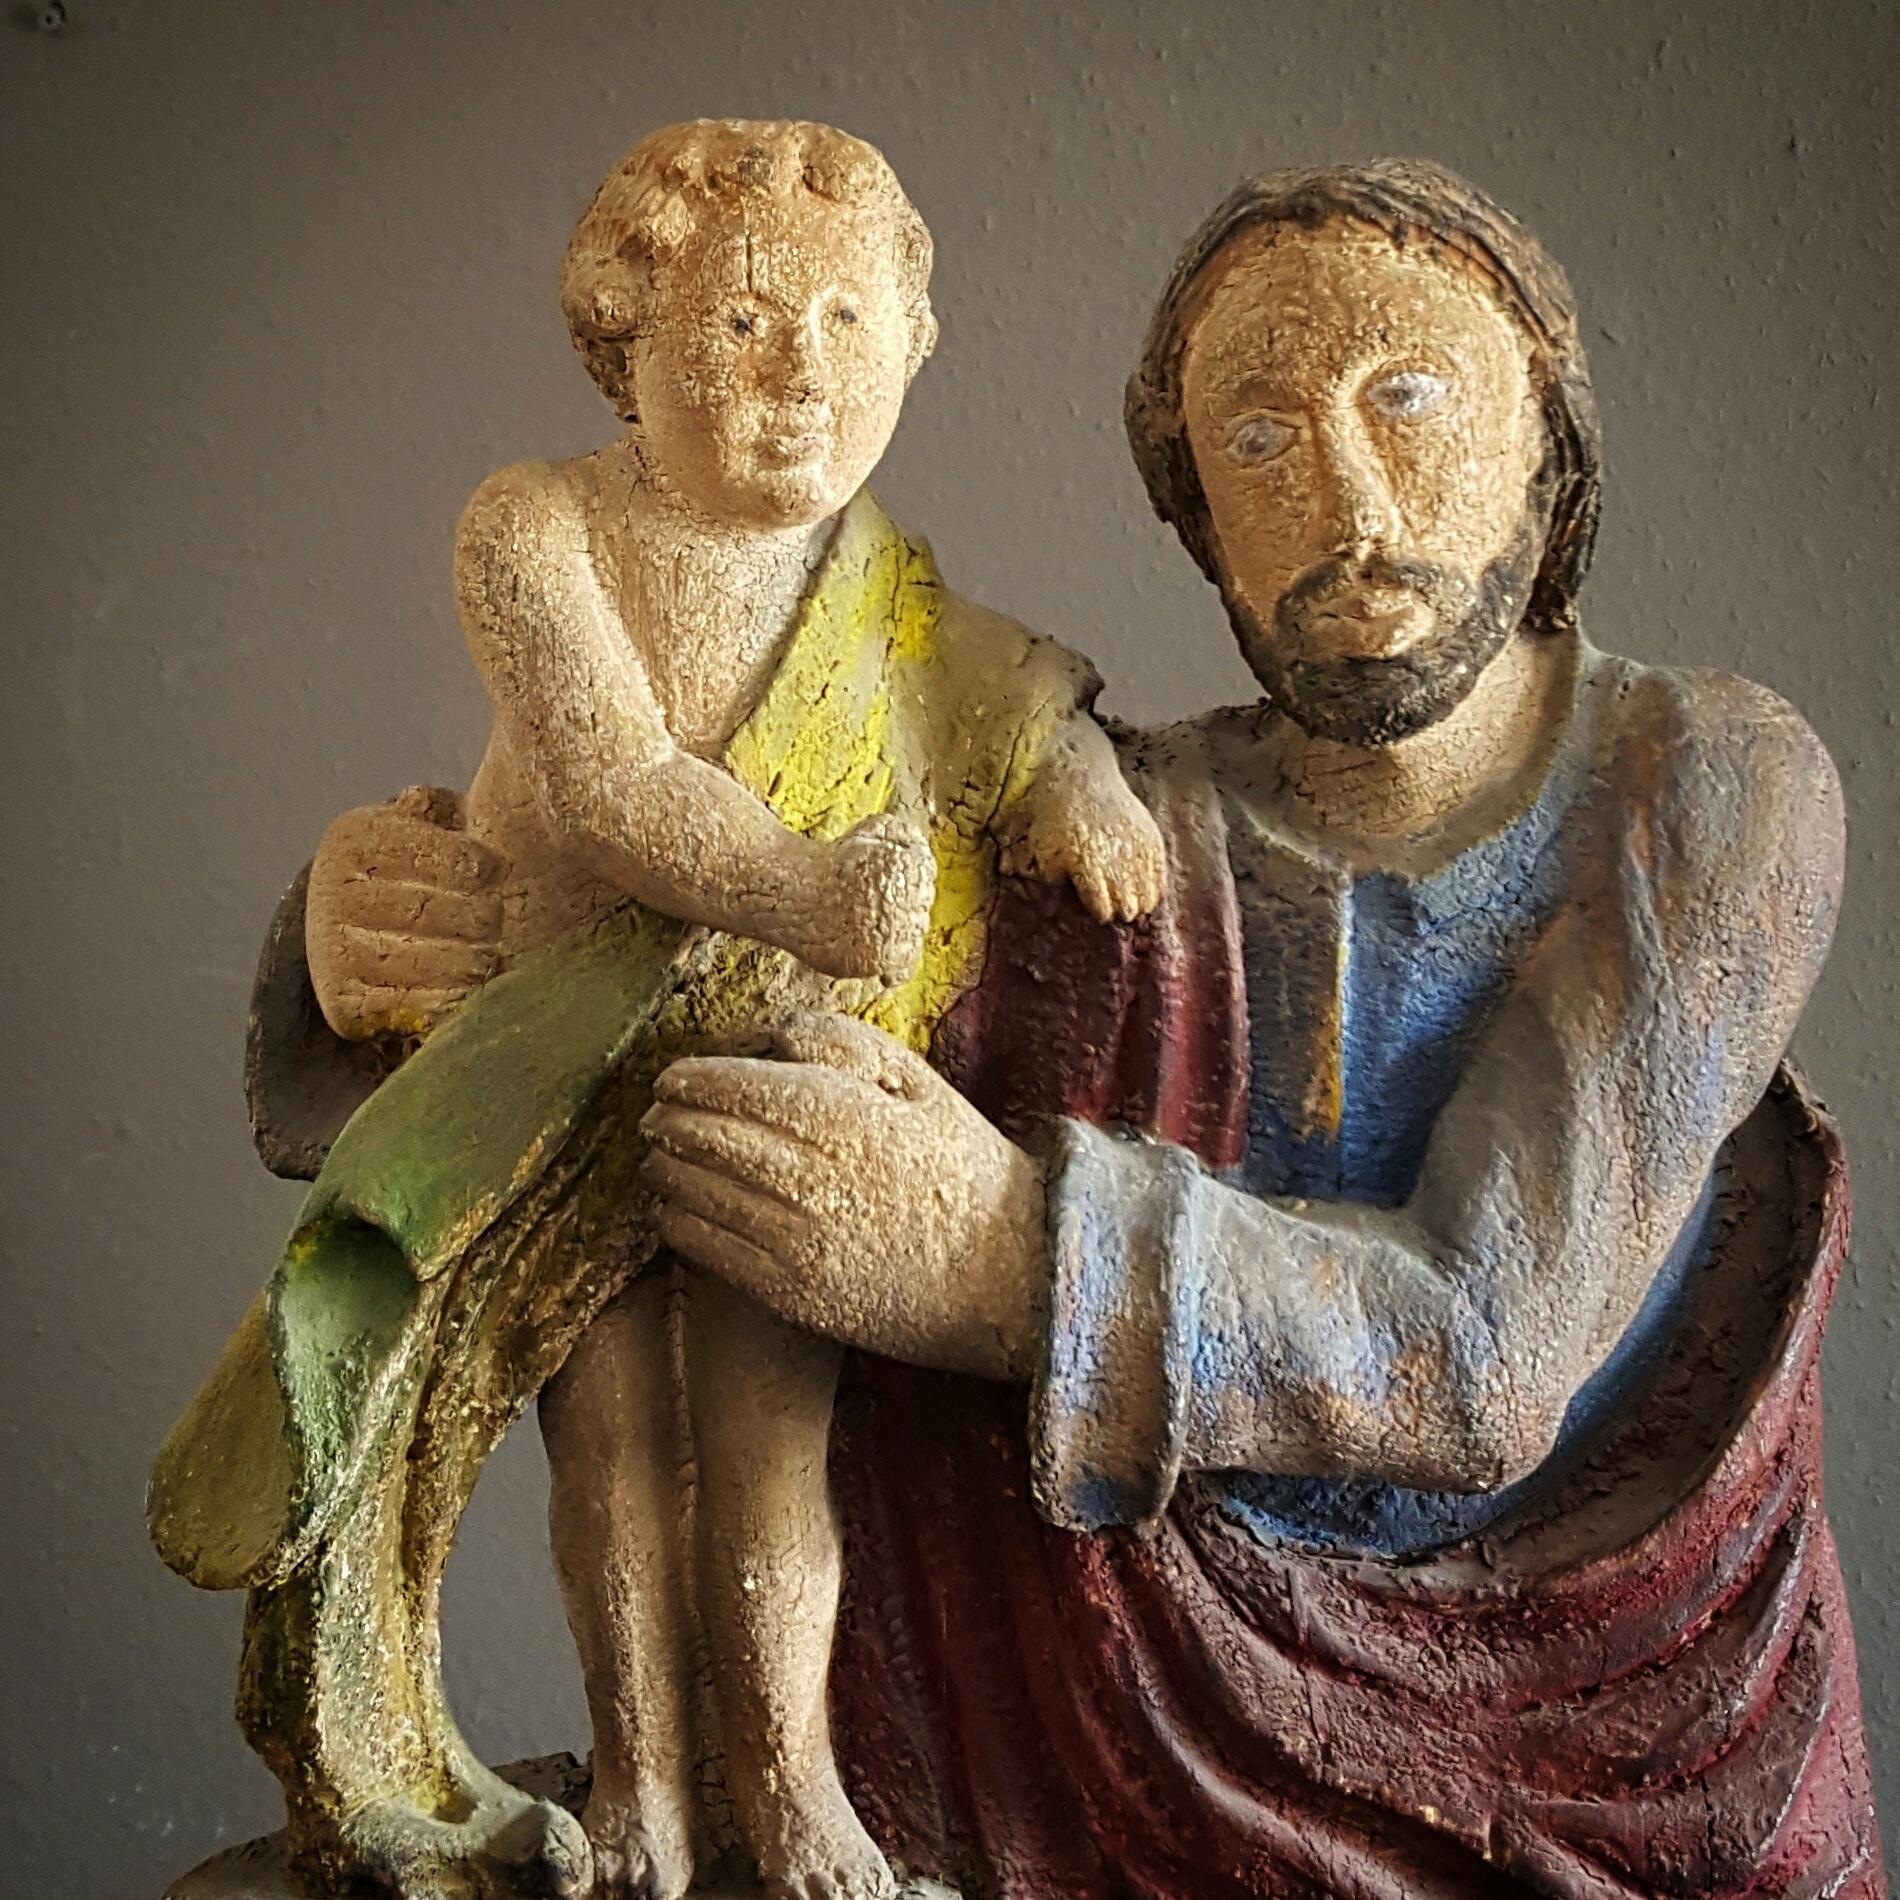 Polychrome Saint Joseph